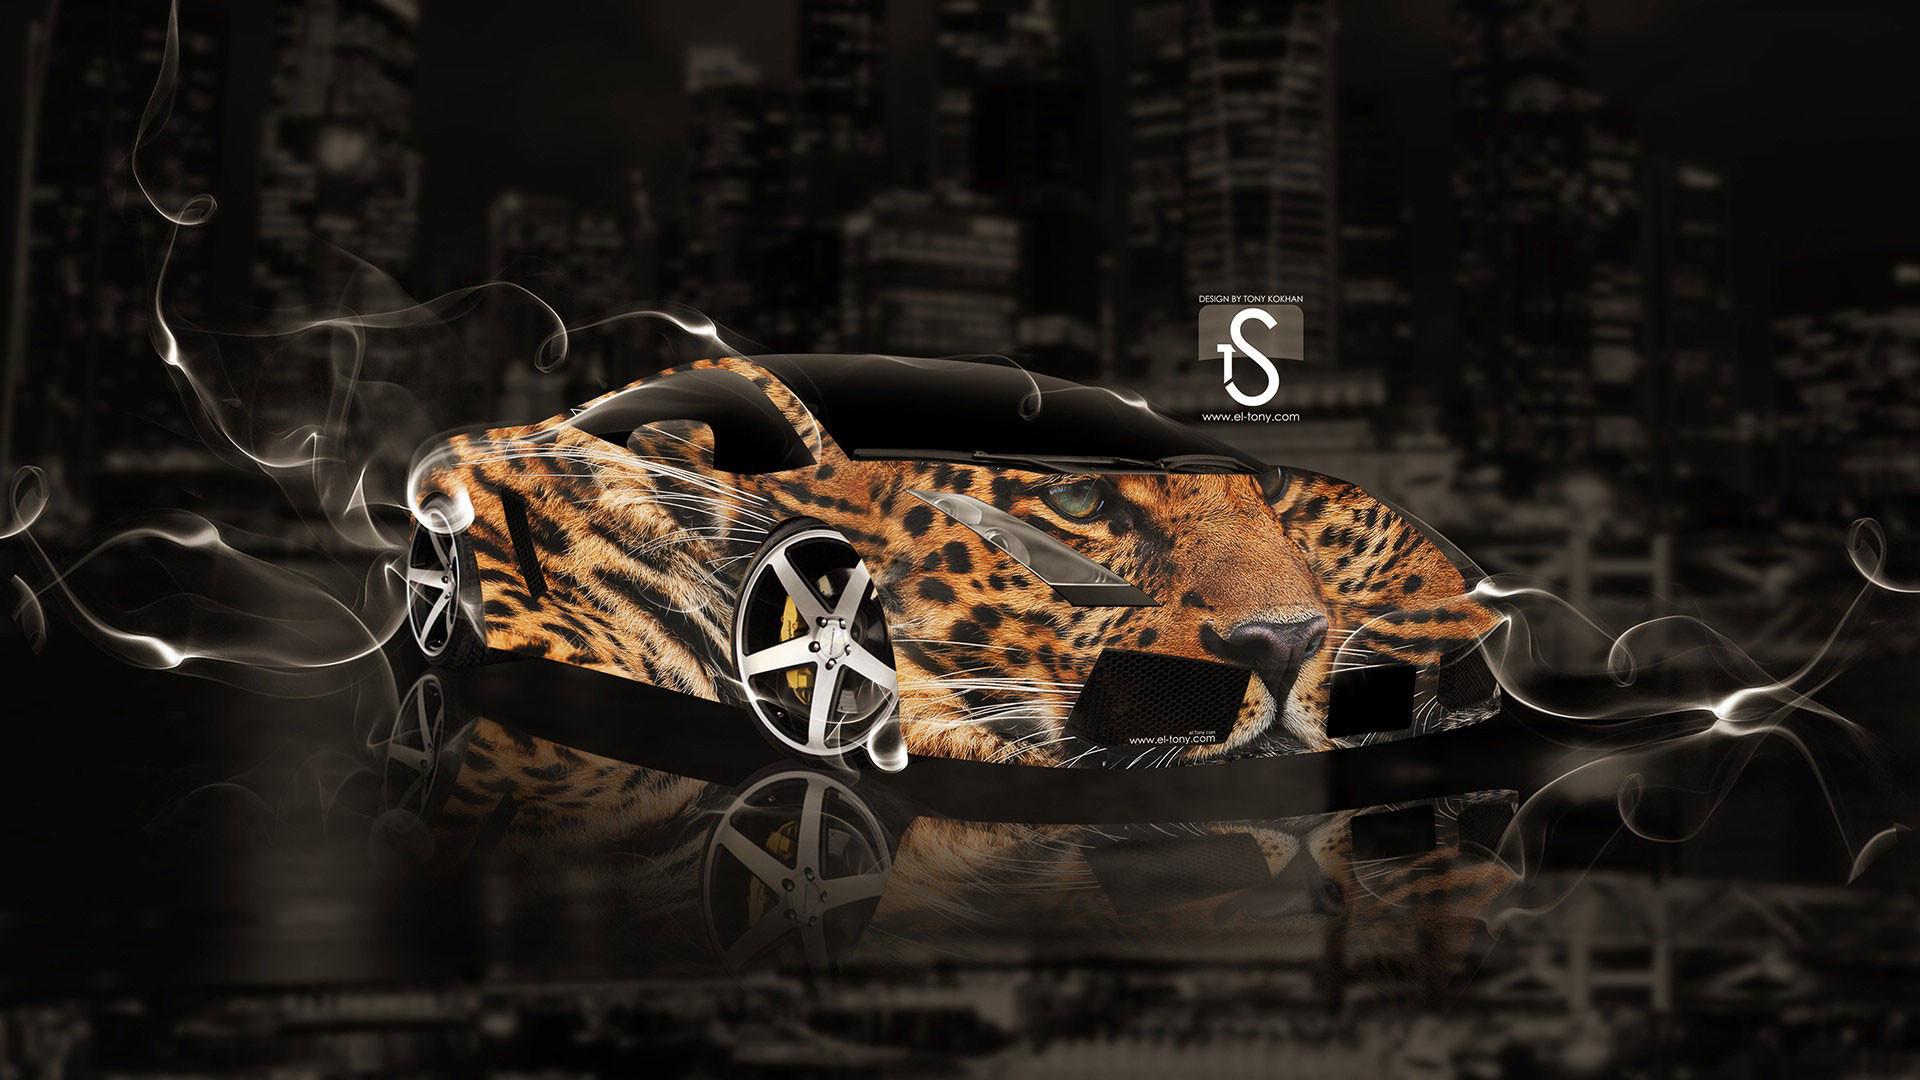 Animated Cheetah Wallpaper animated smoke wallpaper (61+ images)